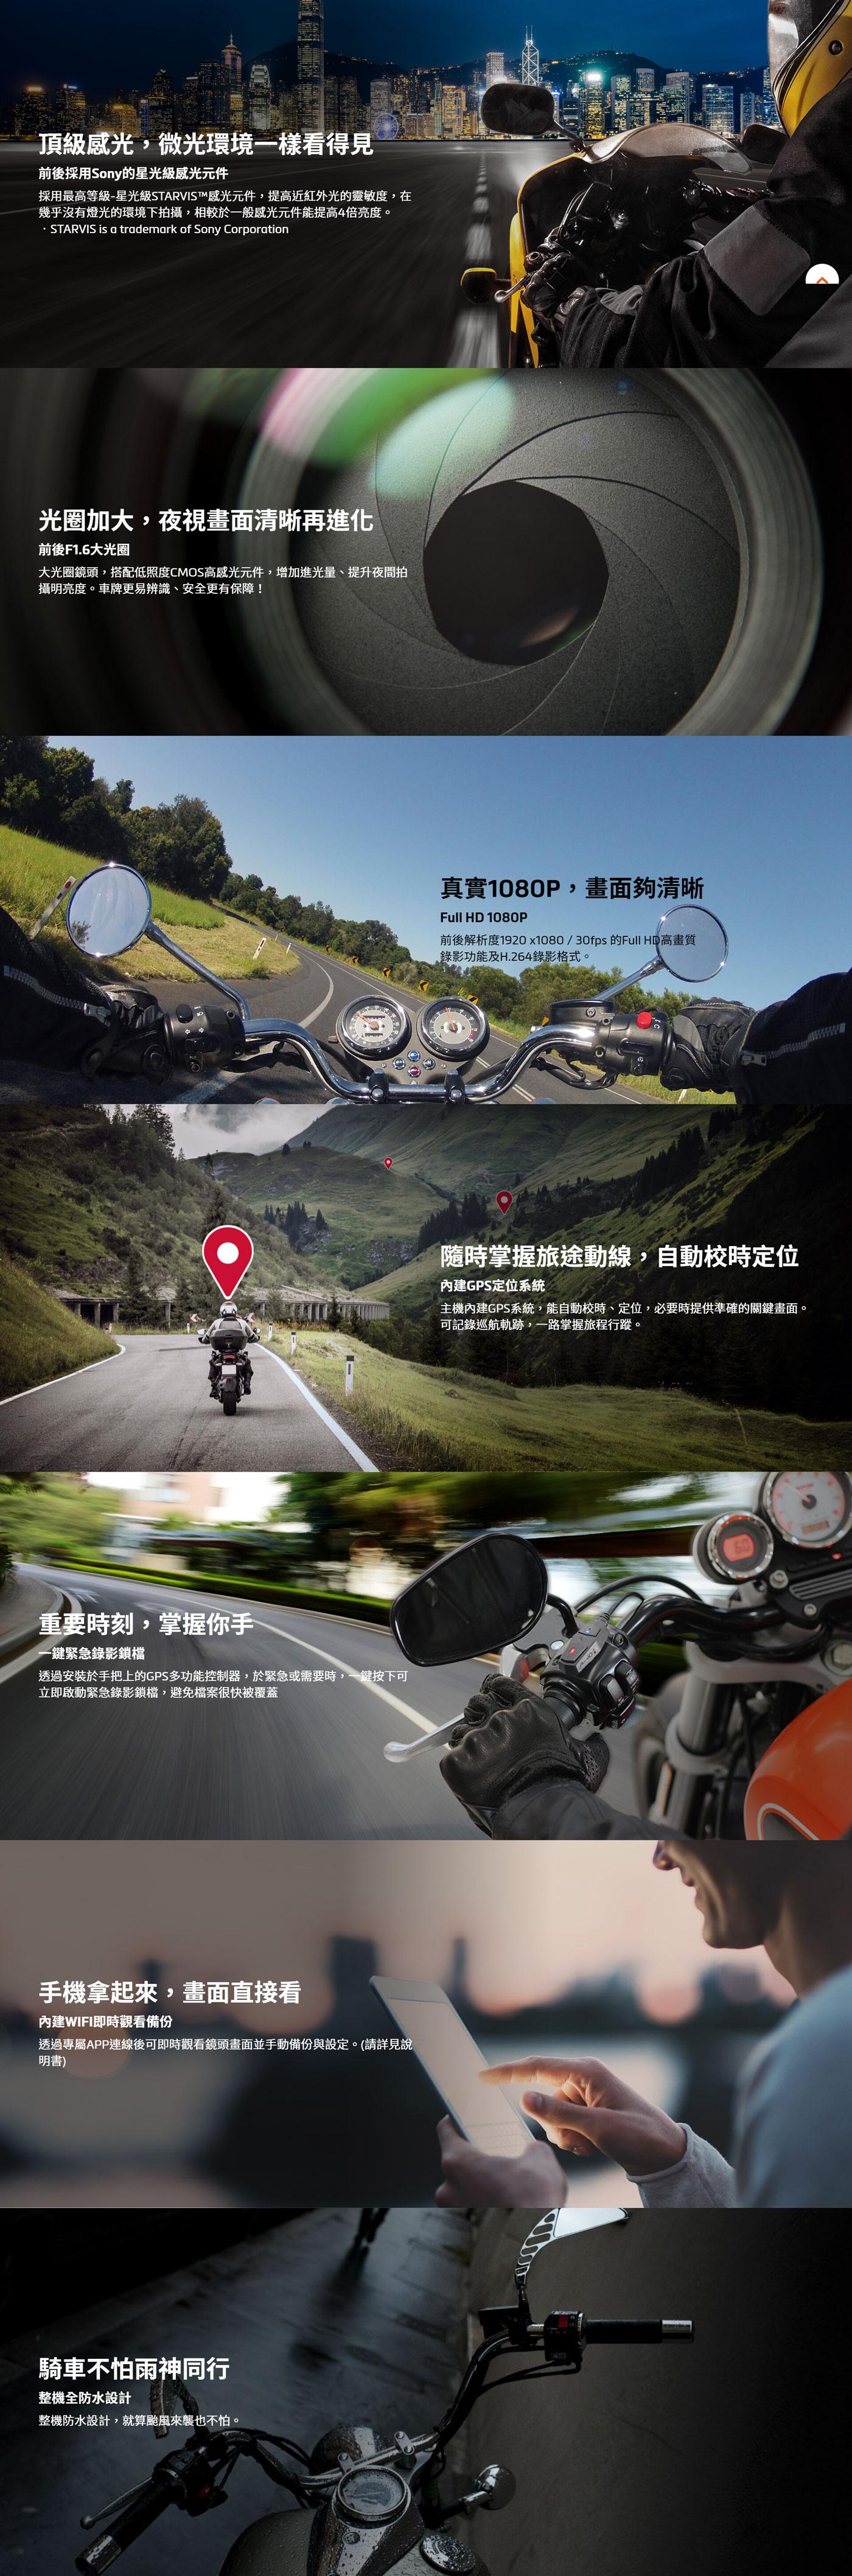 Mio MiVue勁系列 M760D GPS & WiFi 雙鏡頭行車記錄器試用 麻雀雖小五臟俱全